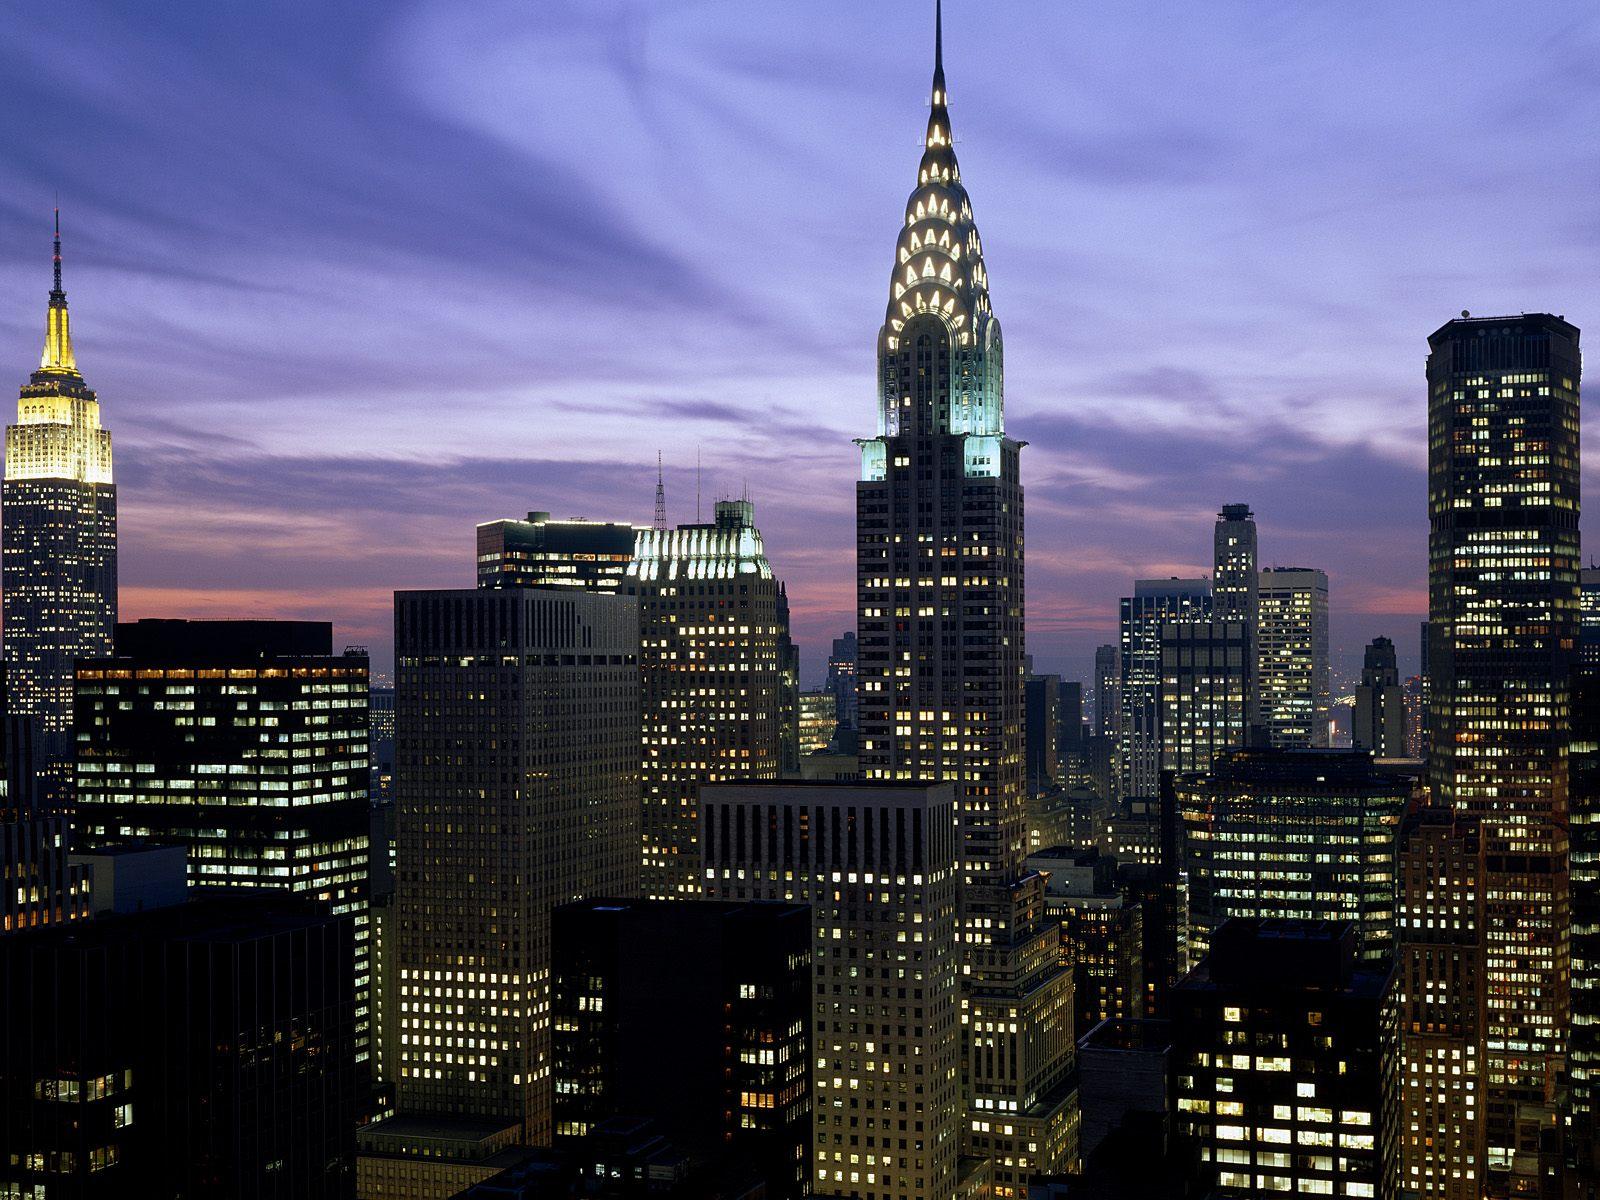 Download New York City Wallpaper Hd 1600x1200 123898 Full Size 1600x1200